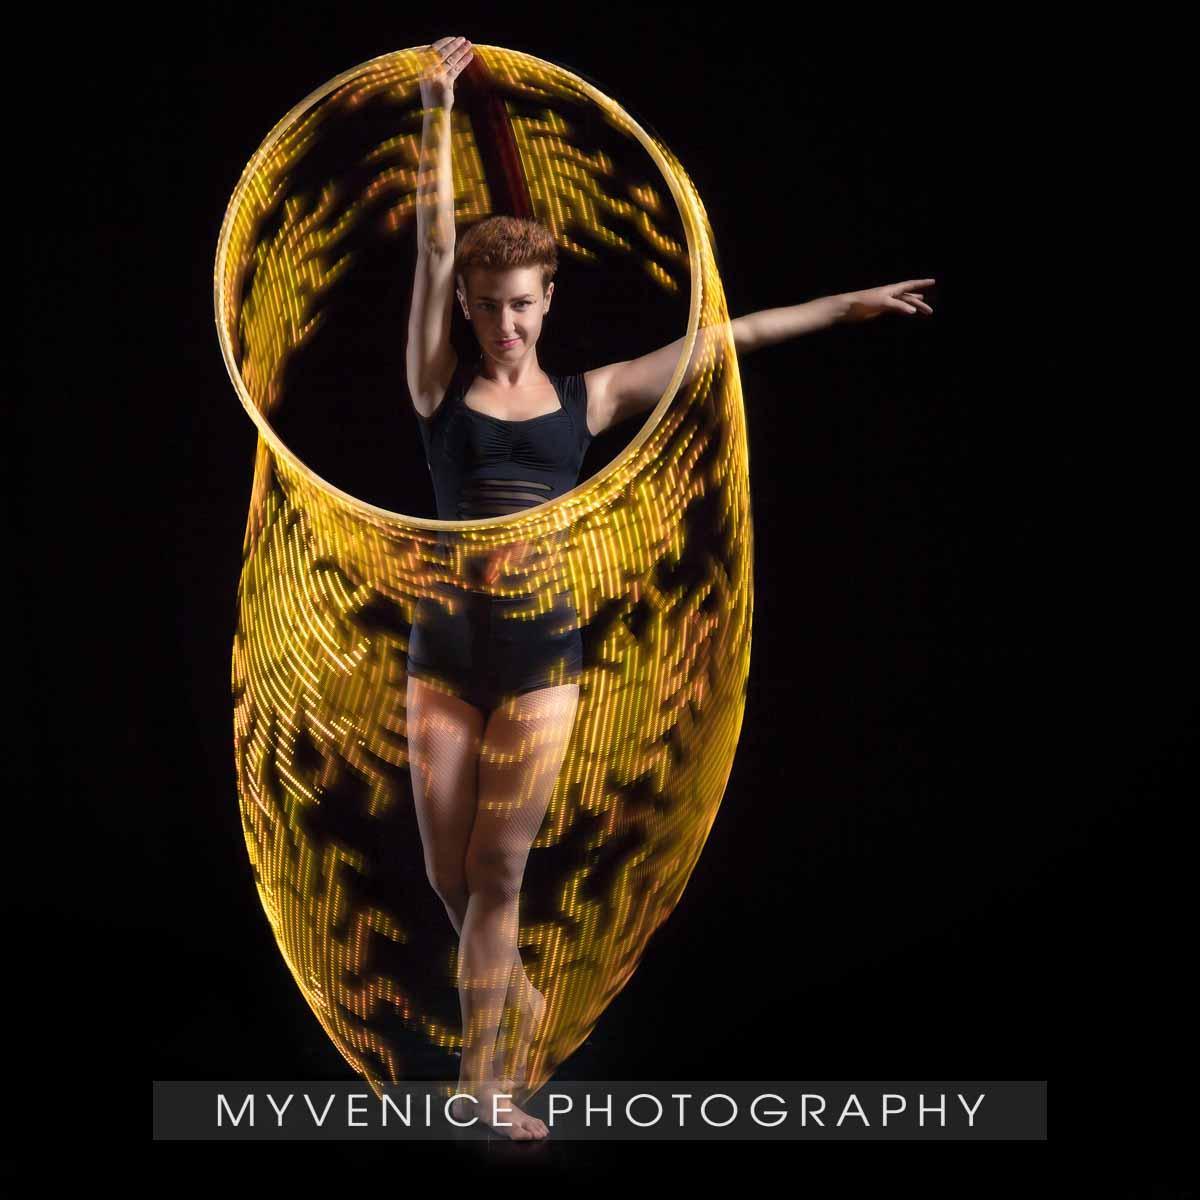 Myvenicephotography 1